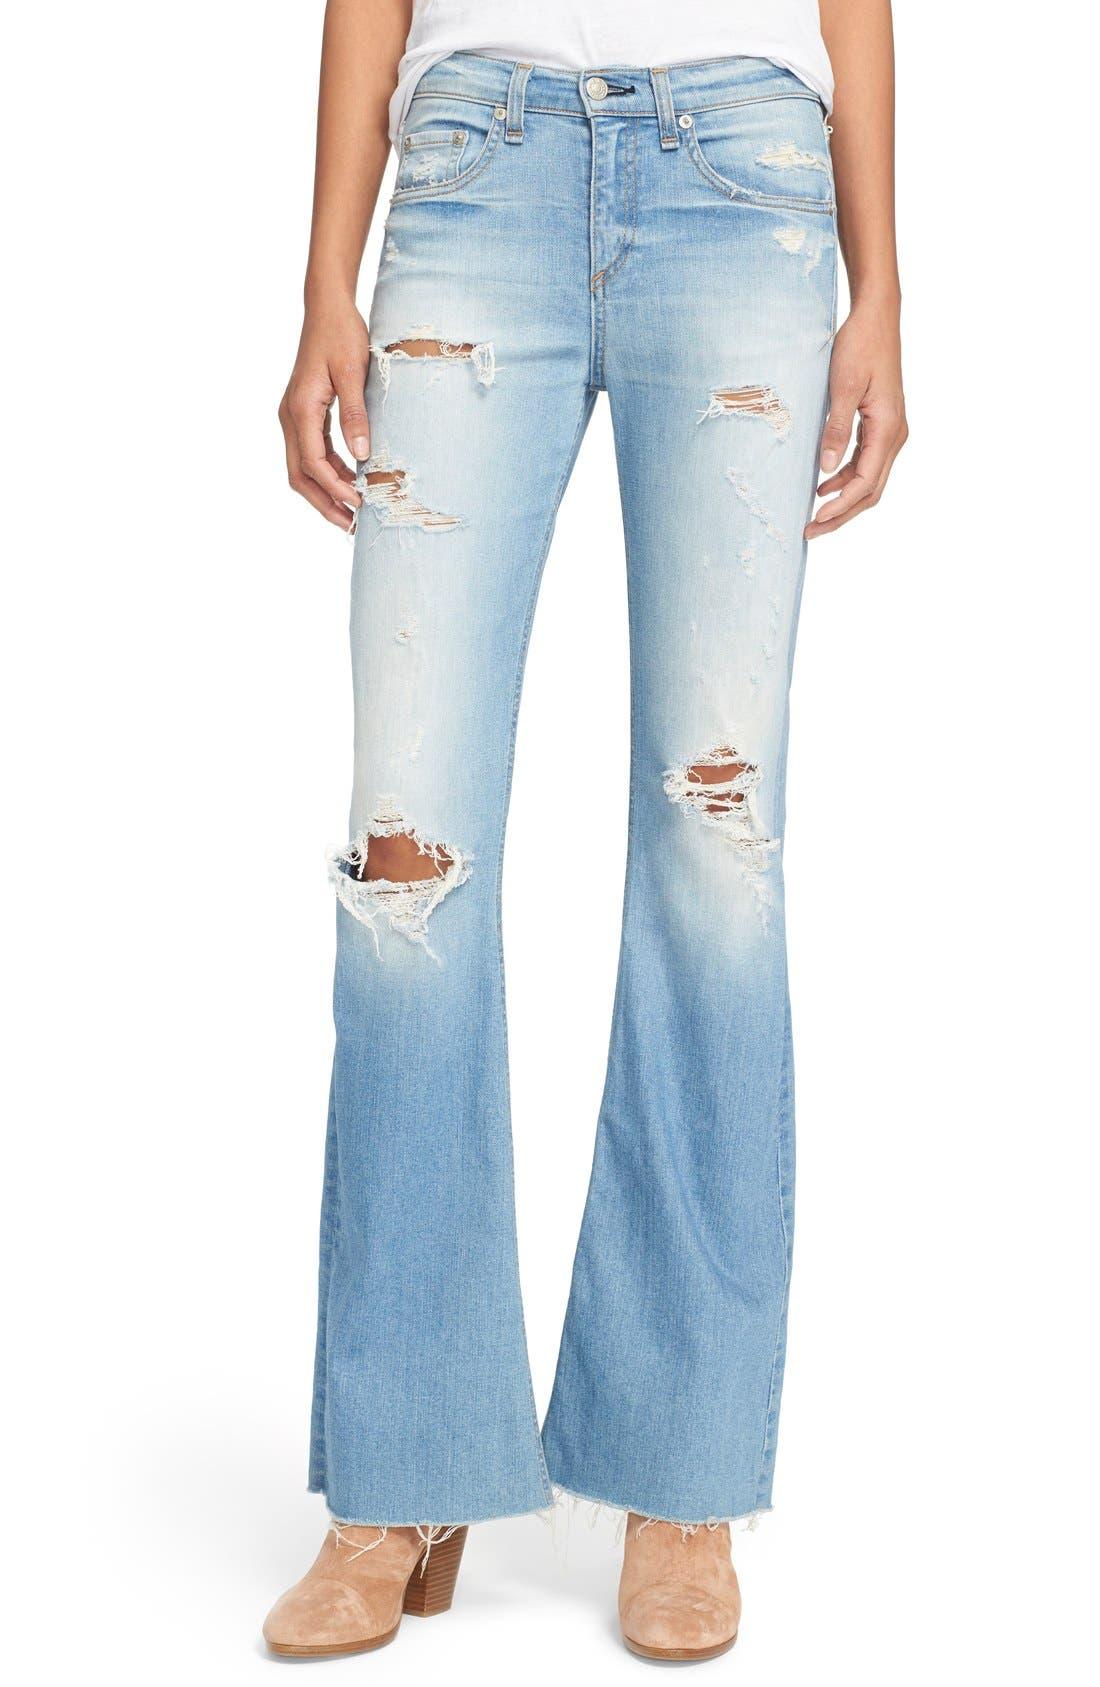 Alternate Image 1 Selected - rag & bone/JEAN 'Beach' High Rise Bell Bottom Jeans (Ryder)